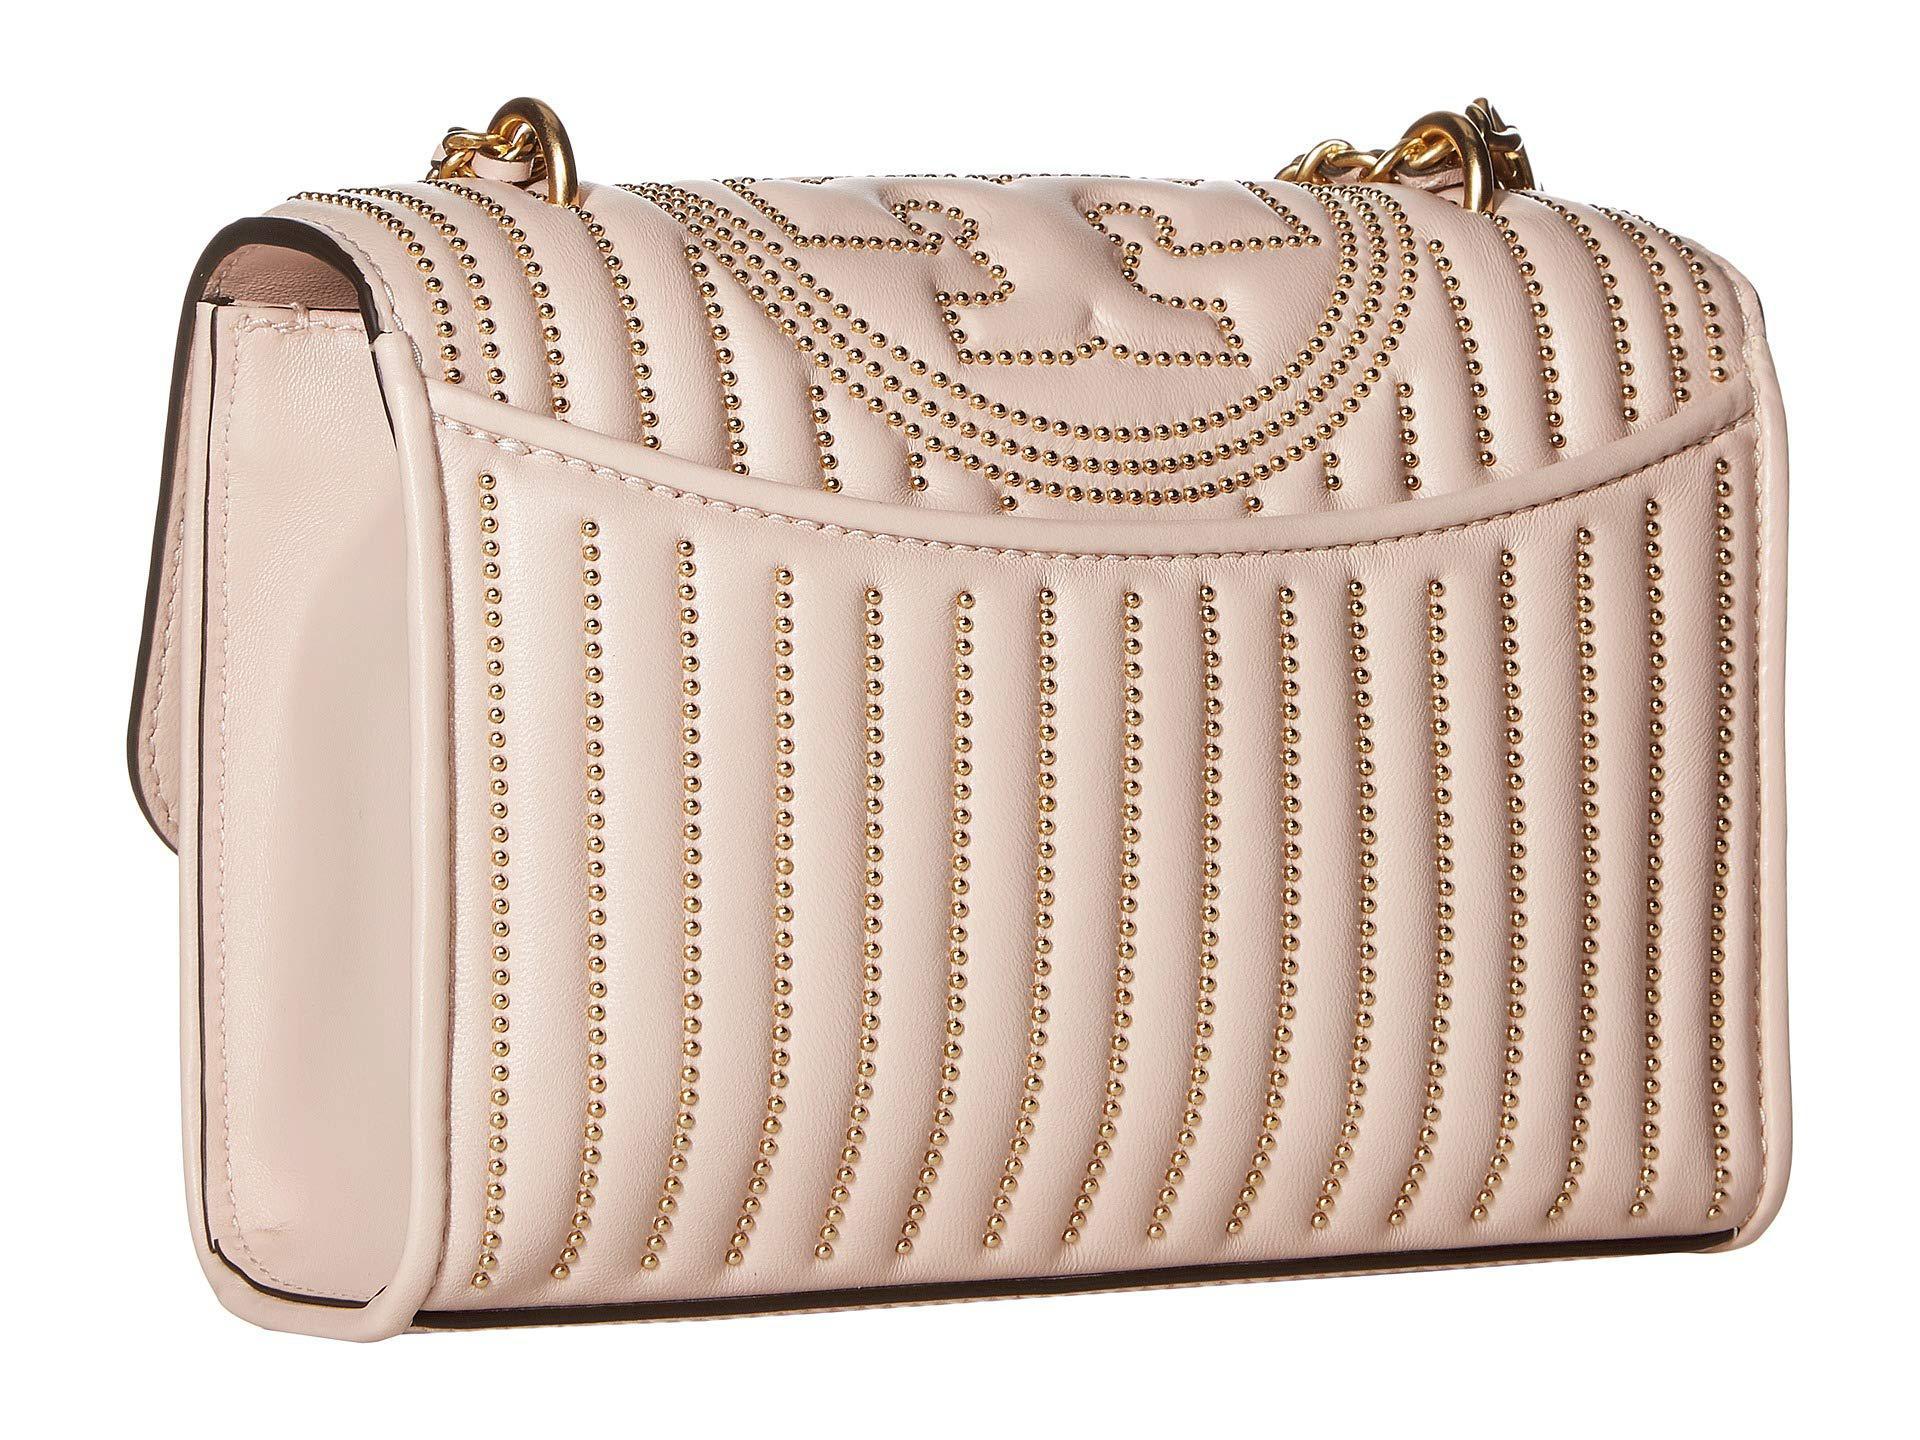 8dd7d1e10f06 Tory Burch - Pink Fleming Mini Stud Small Convertible Shoulder Bag  (black silver). View fullscreen